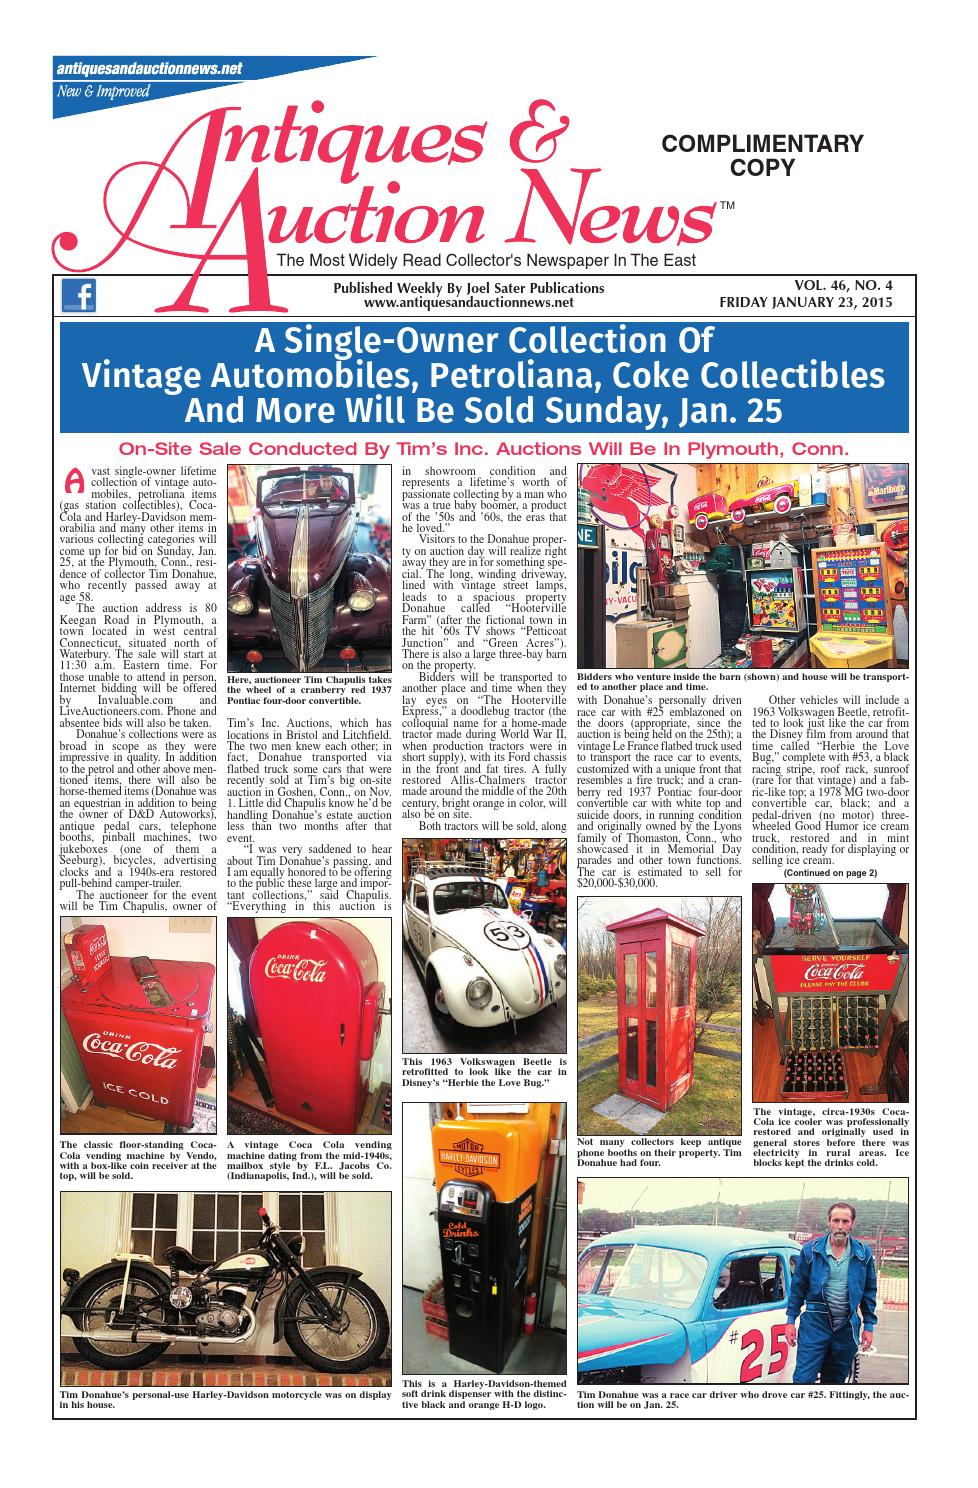 Antiques & Auction News 012315 by Antiques & Auction News